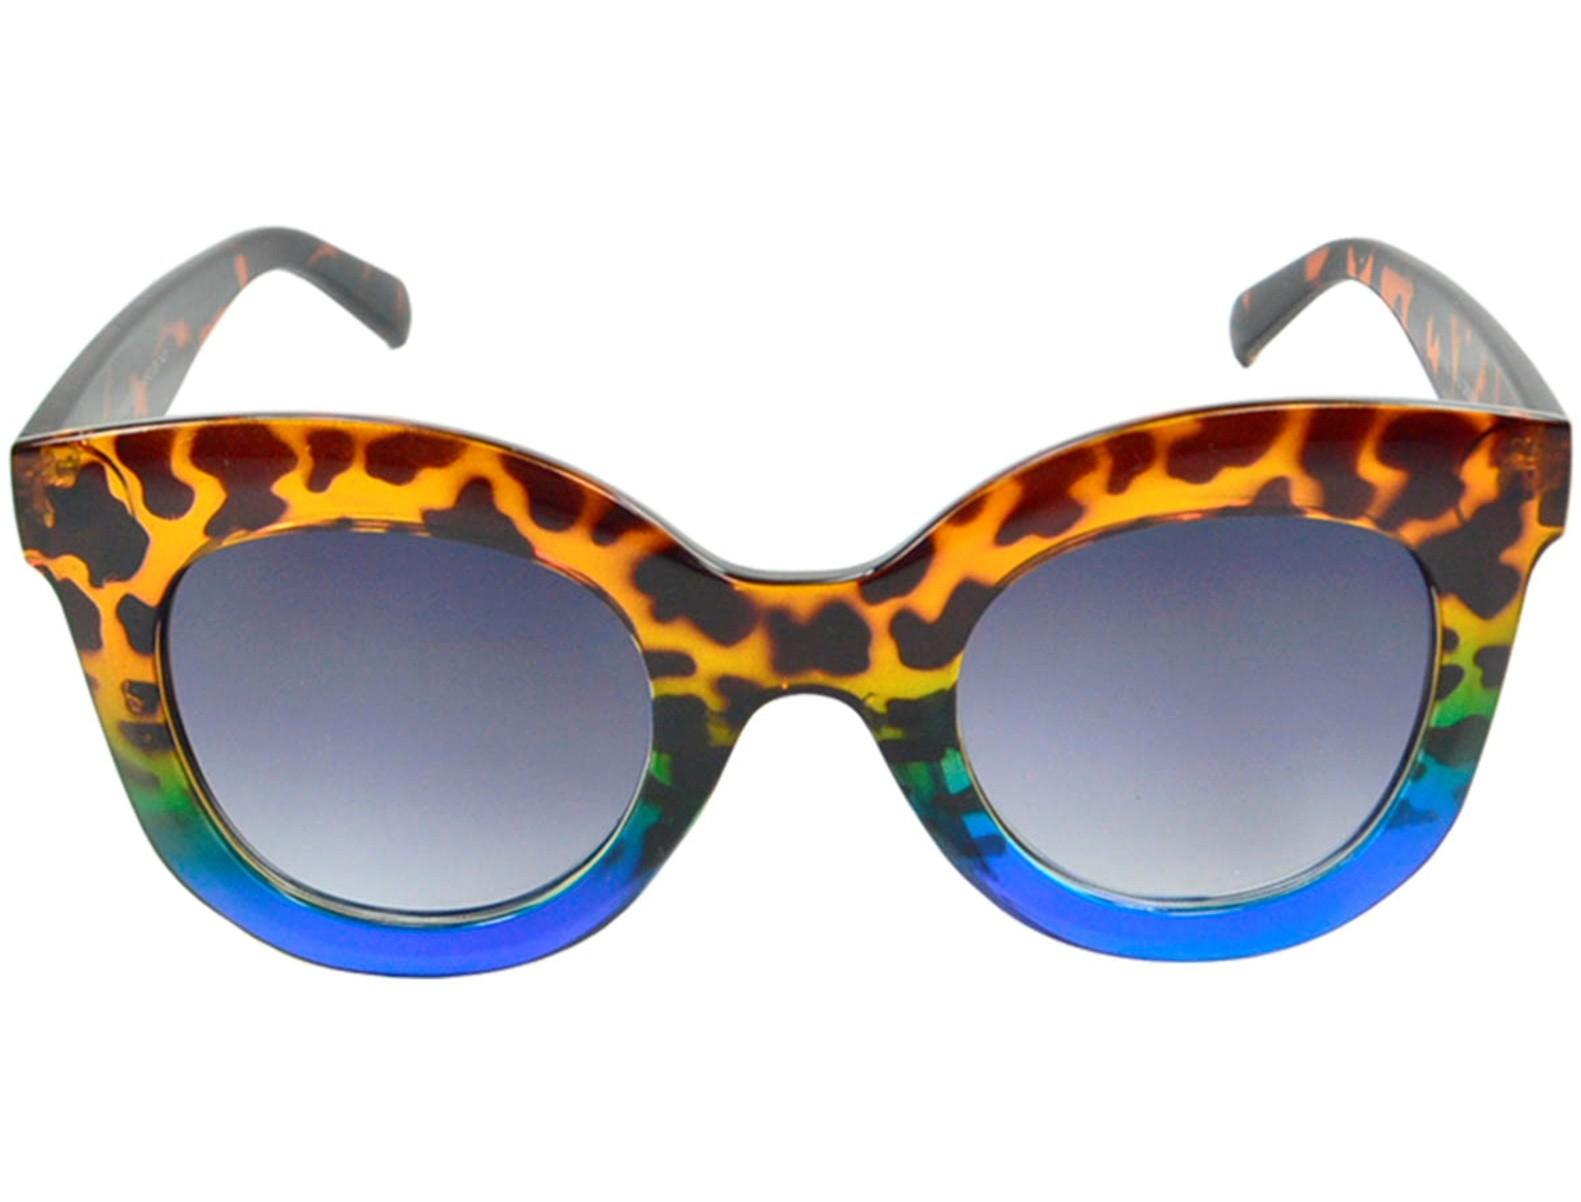 Óculos De Sol Mackage Acetato Feminino Oversize Redondo Retrô - Tarta Azul